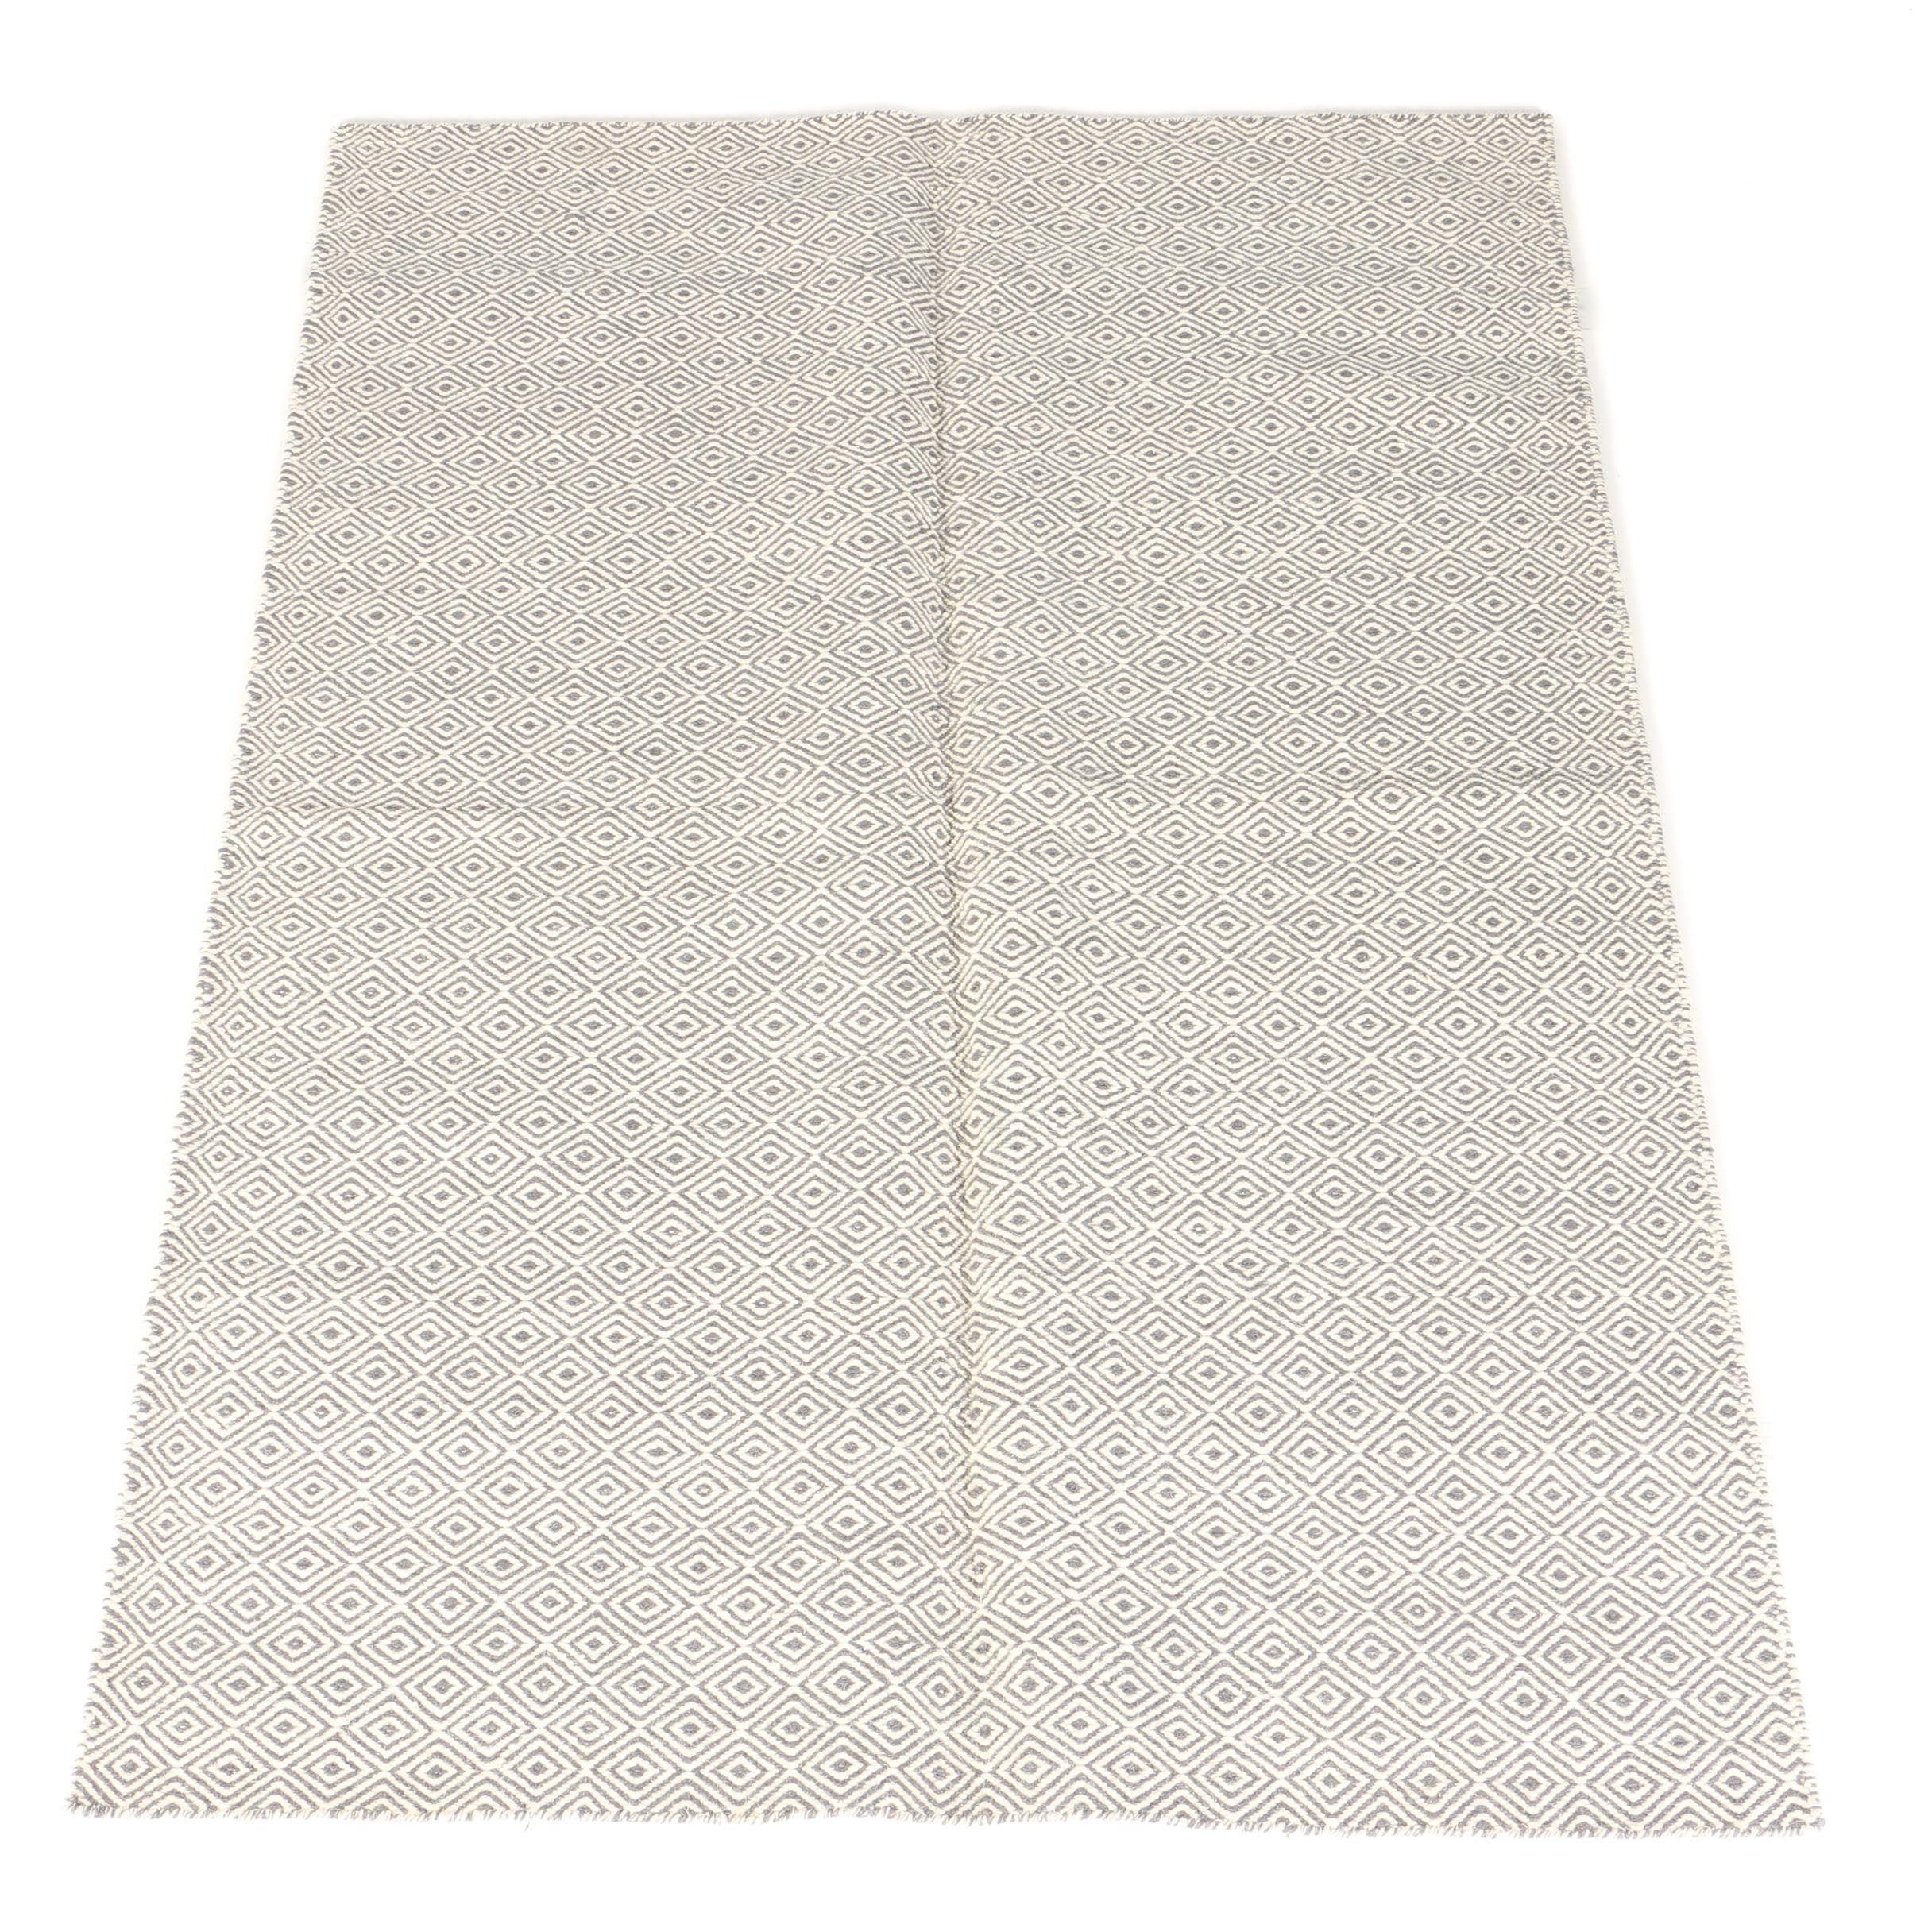 Handwoven Indian Wool Geometric Paddle Area Rug